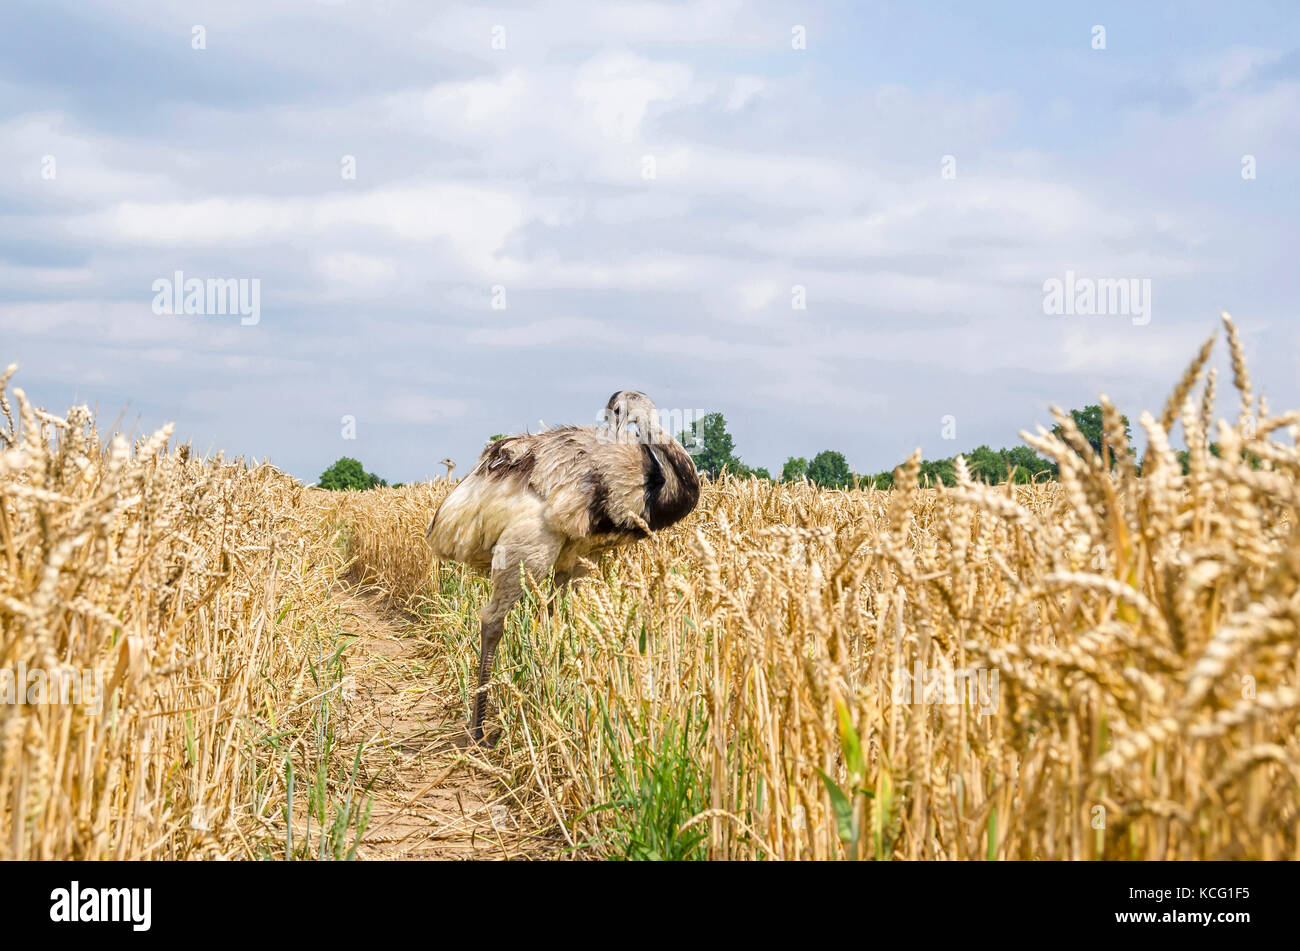 The american greater rhea (Nandu, Rhea americana) cleaning its plumage in a grainfield in Mecklenburg-West Pomerania, - Stock Image